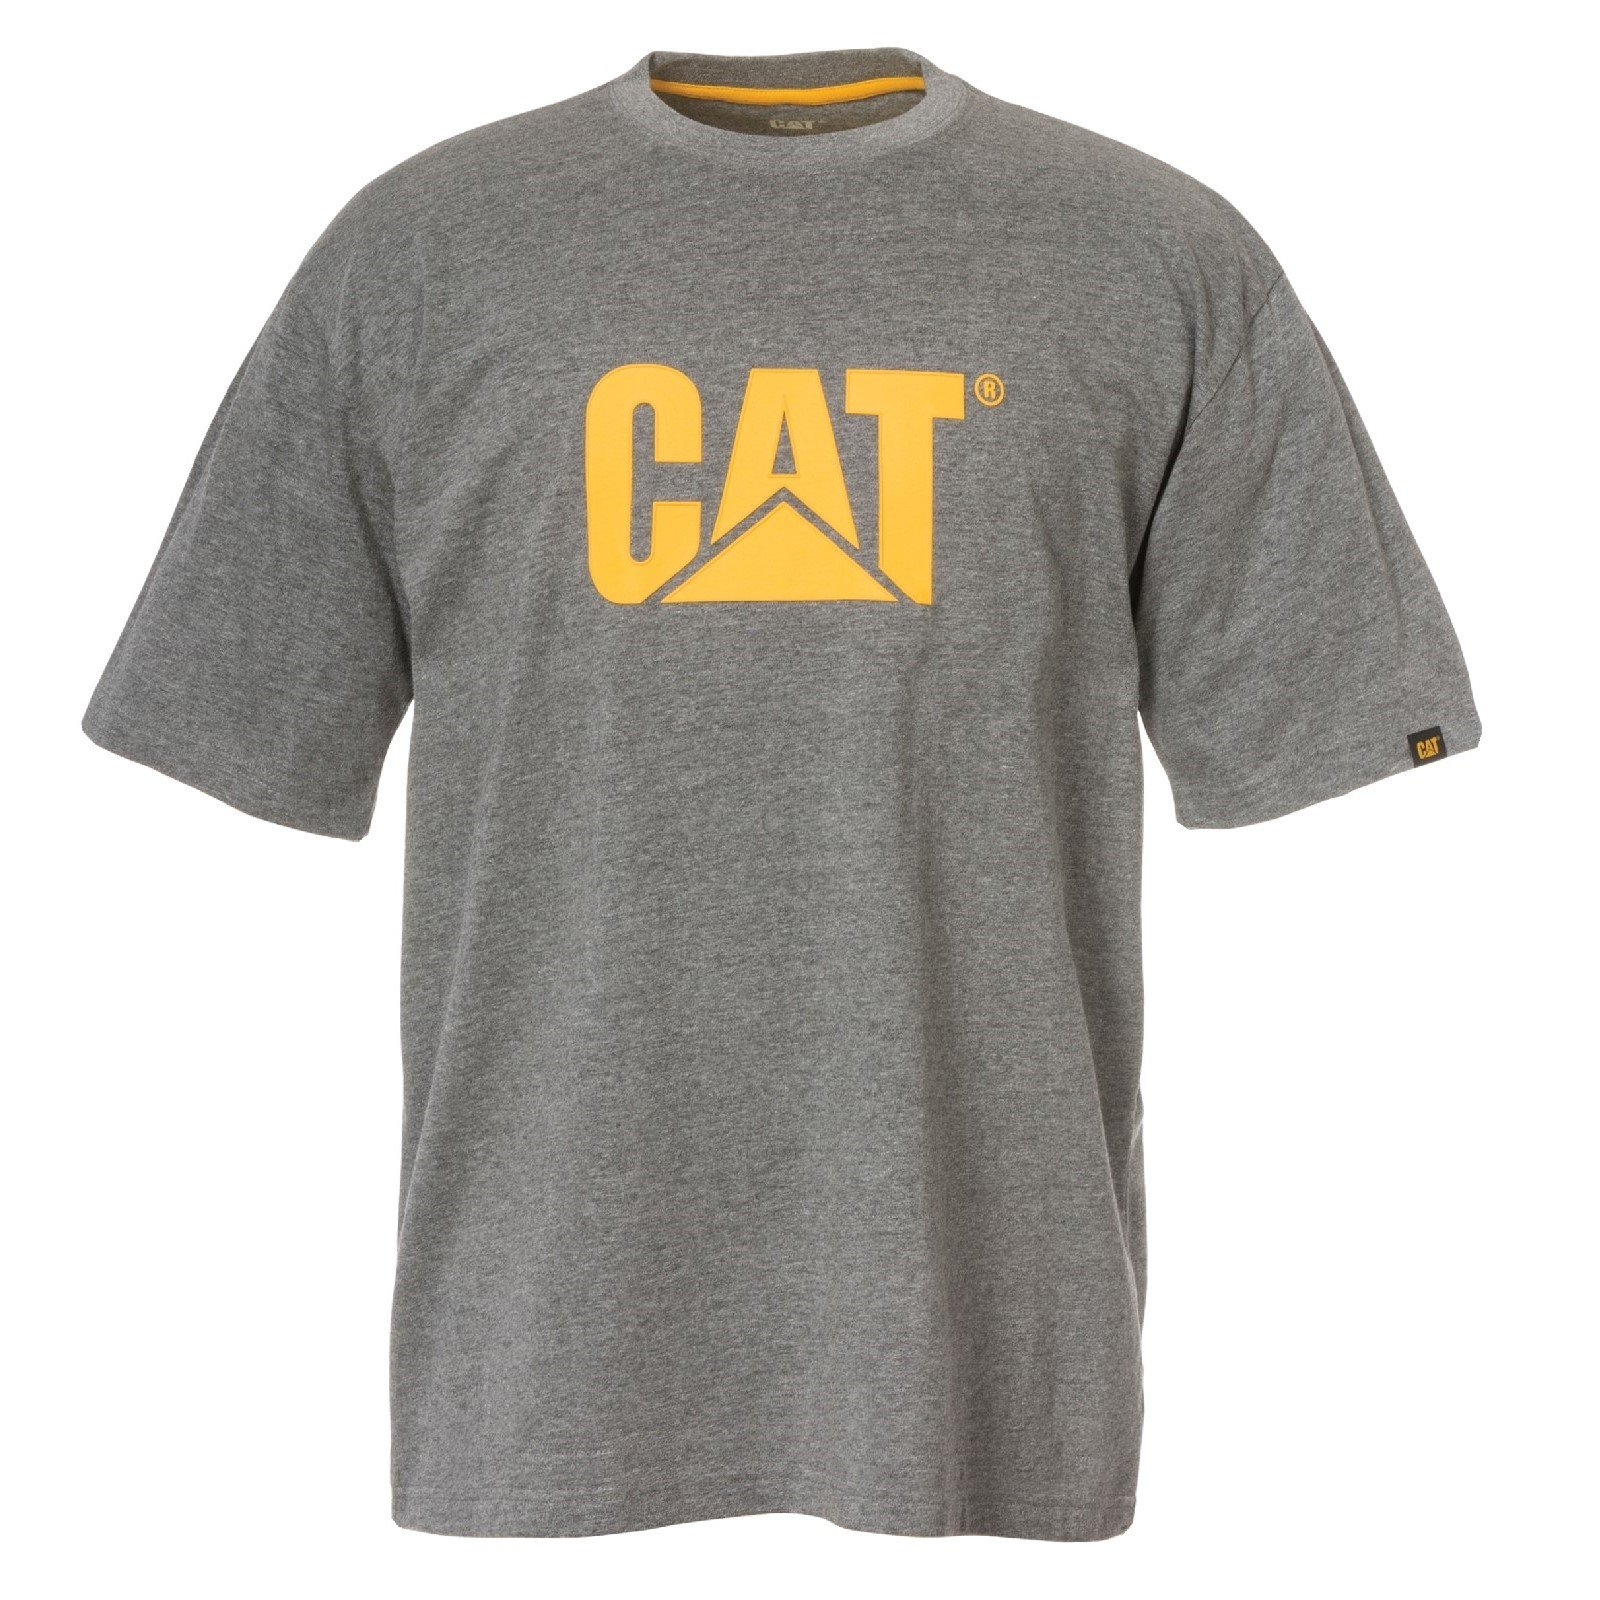 Caterpillar Men's Trademark Logo T-Shirt Various Colours 25301-42086 - Dark Heather Grey 3X